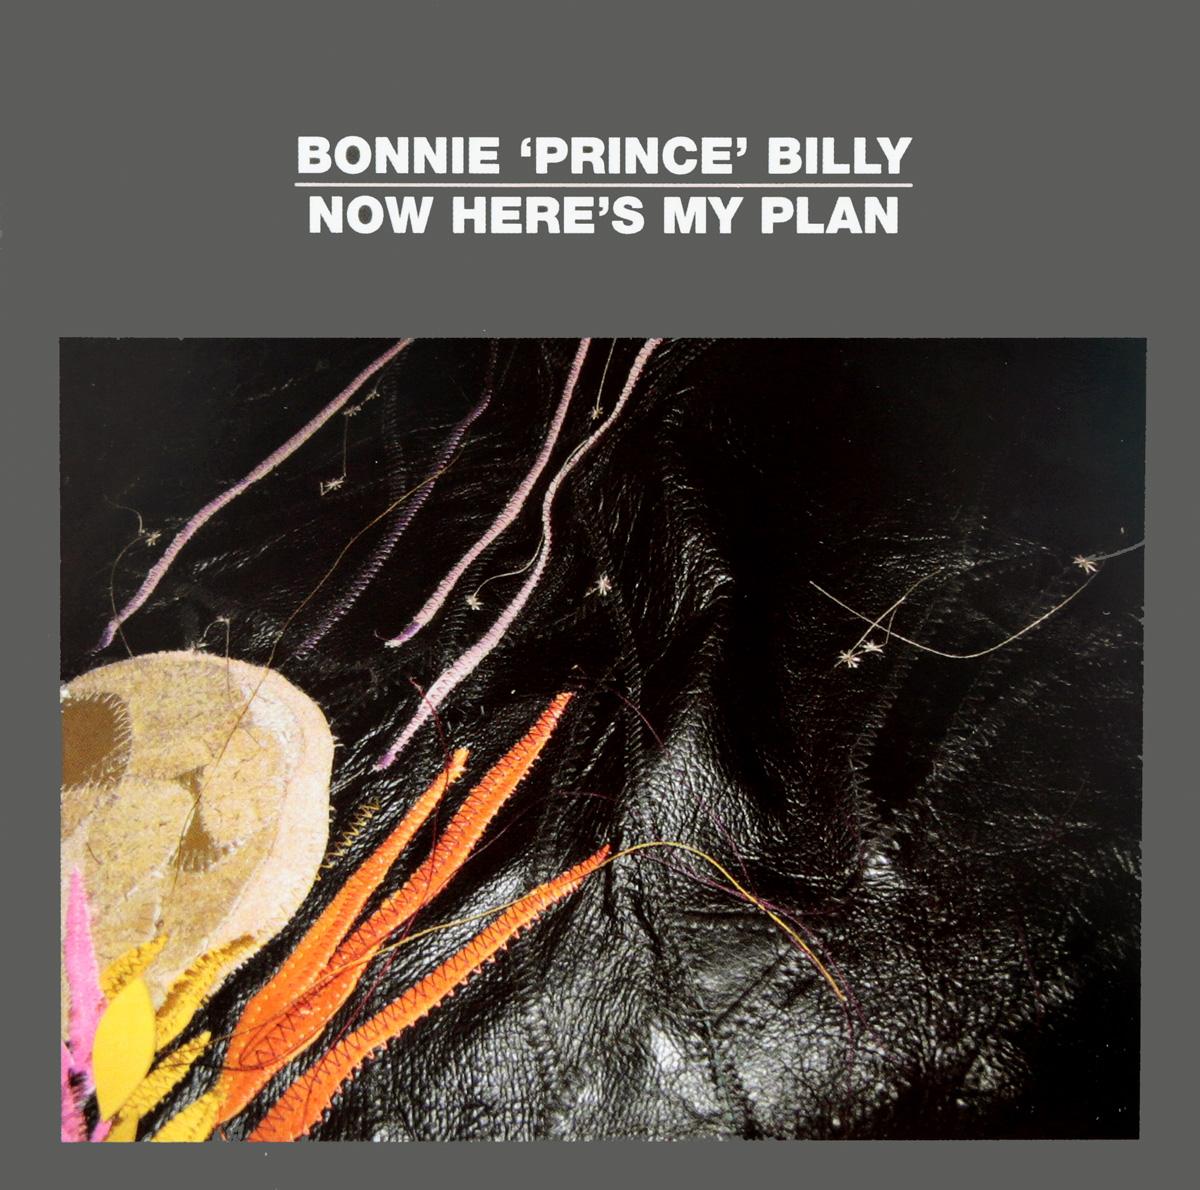 Bg 20a Mcb Miniature Circuit Breaker Departments Diy At Bq Bonnie Prince Billy